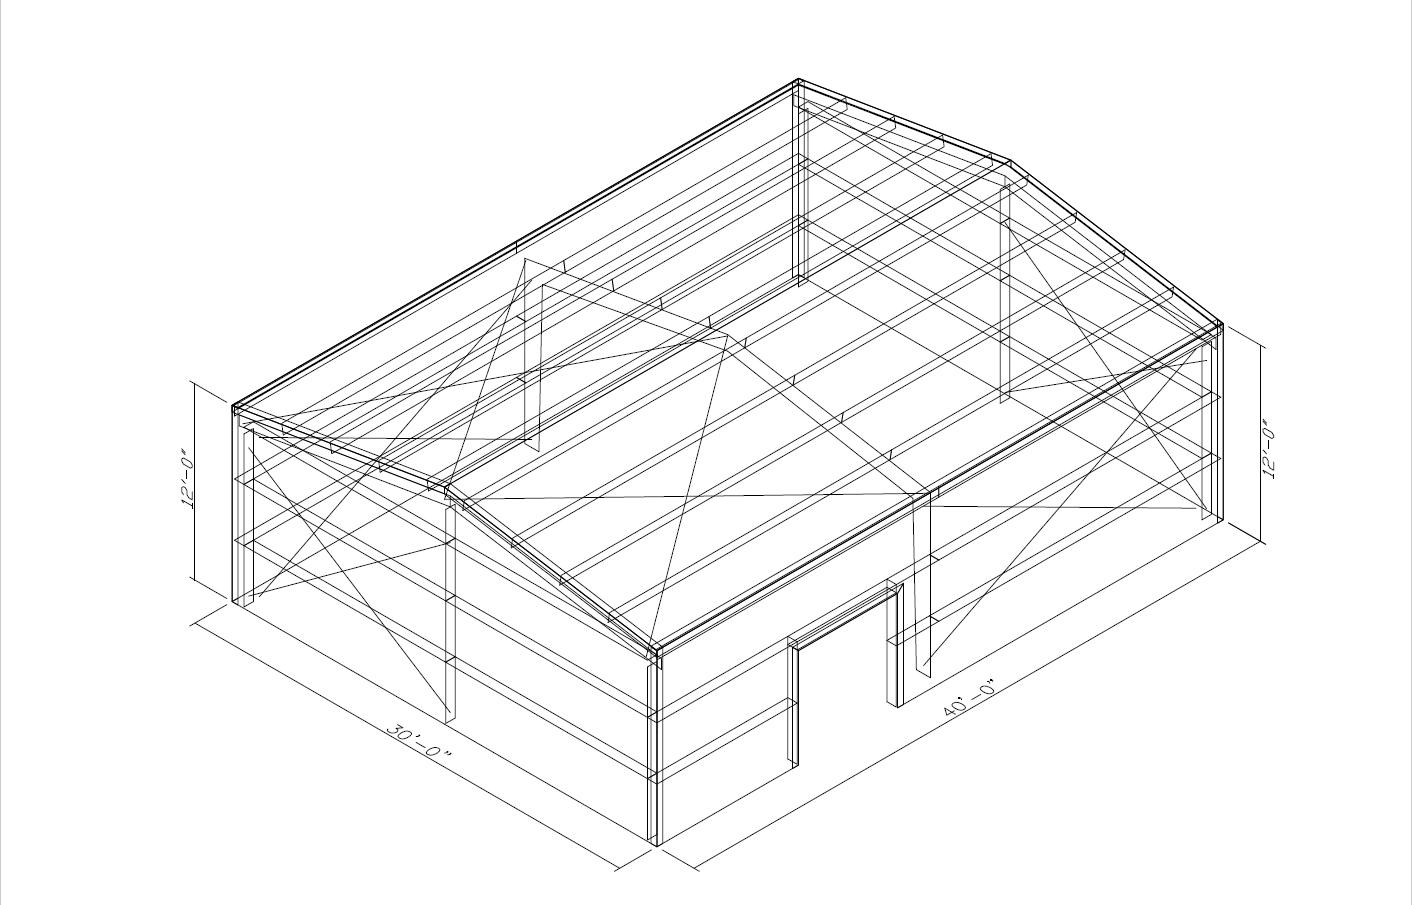 Prefabricated 30 X 40 Metal Buildings For Sale